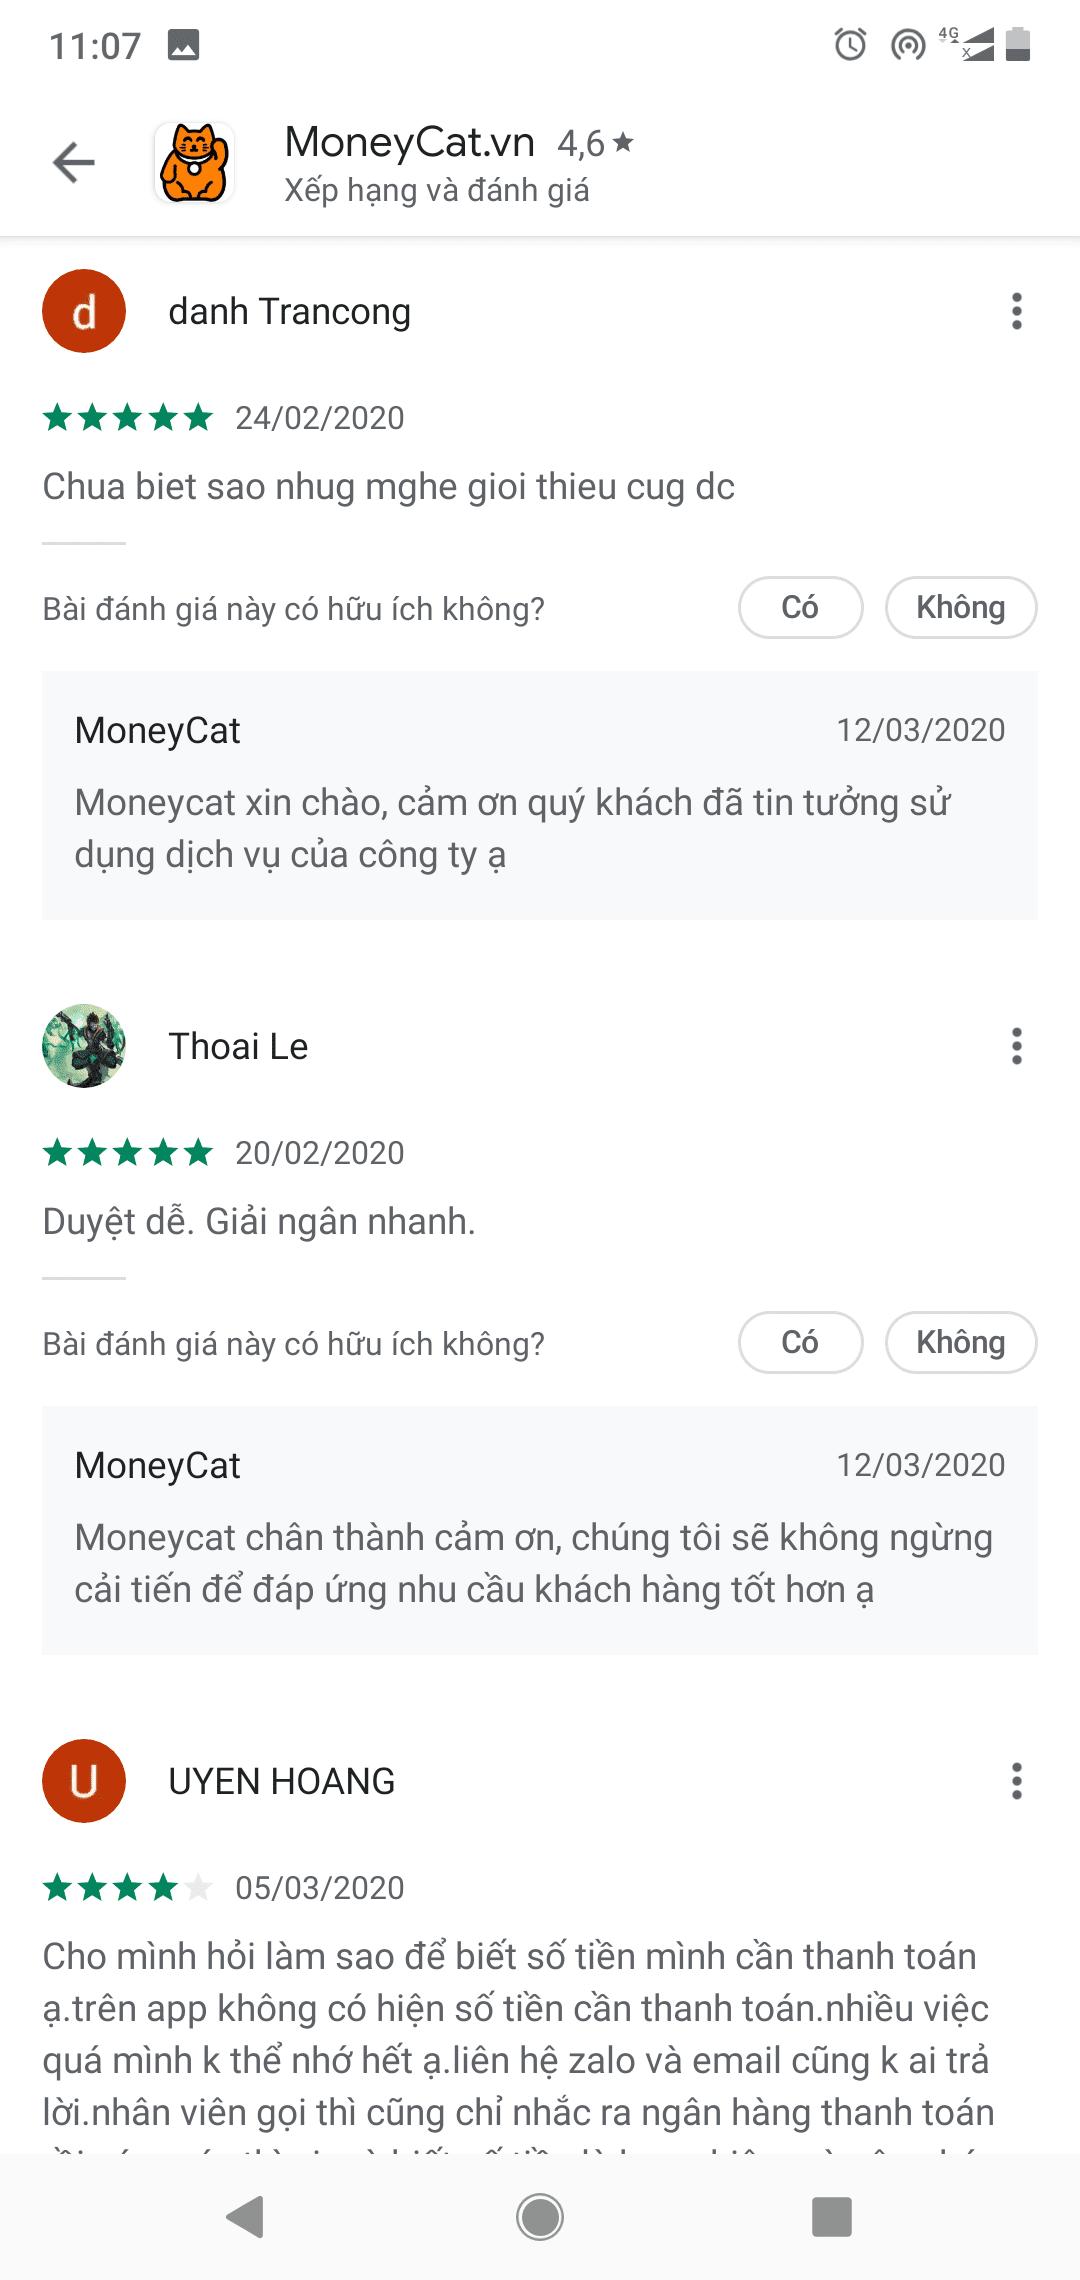 phan-hoi-cua-khach-hang-ve-Money-cat (1)